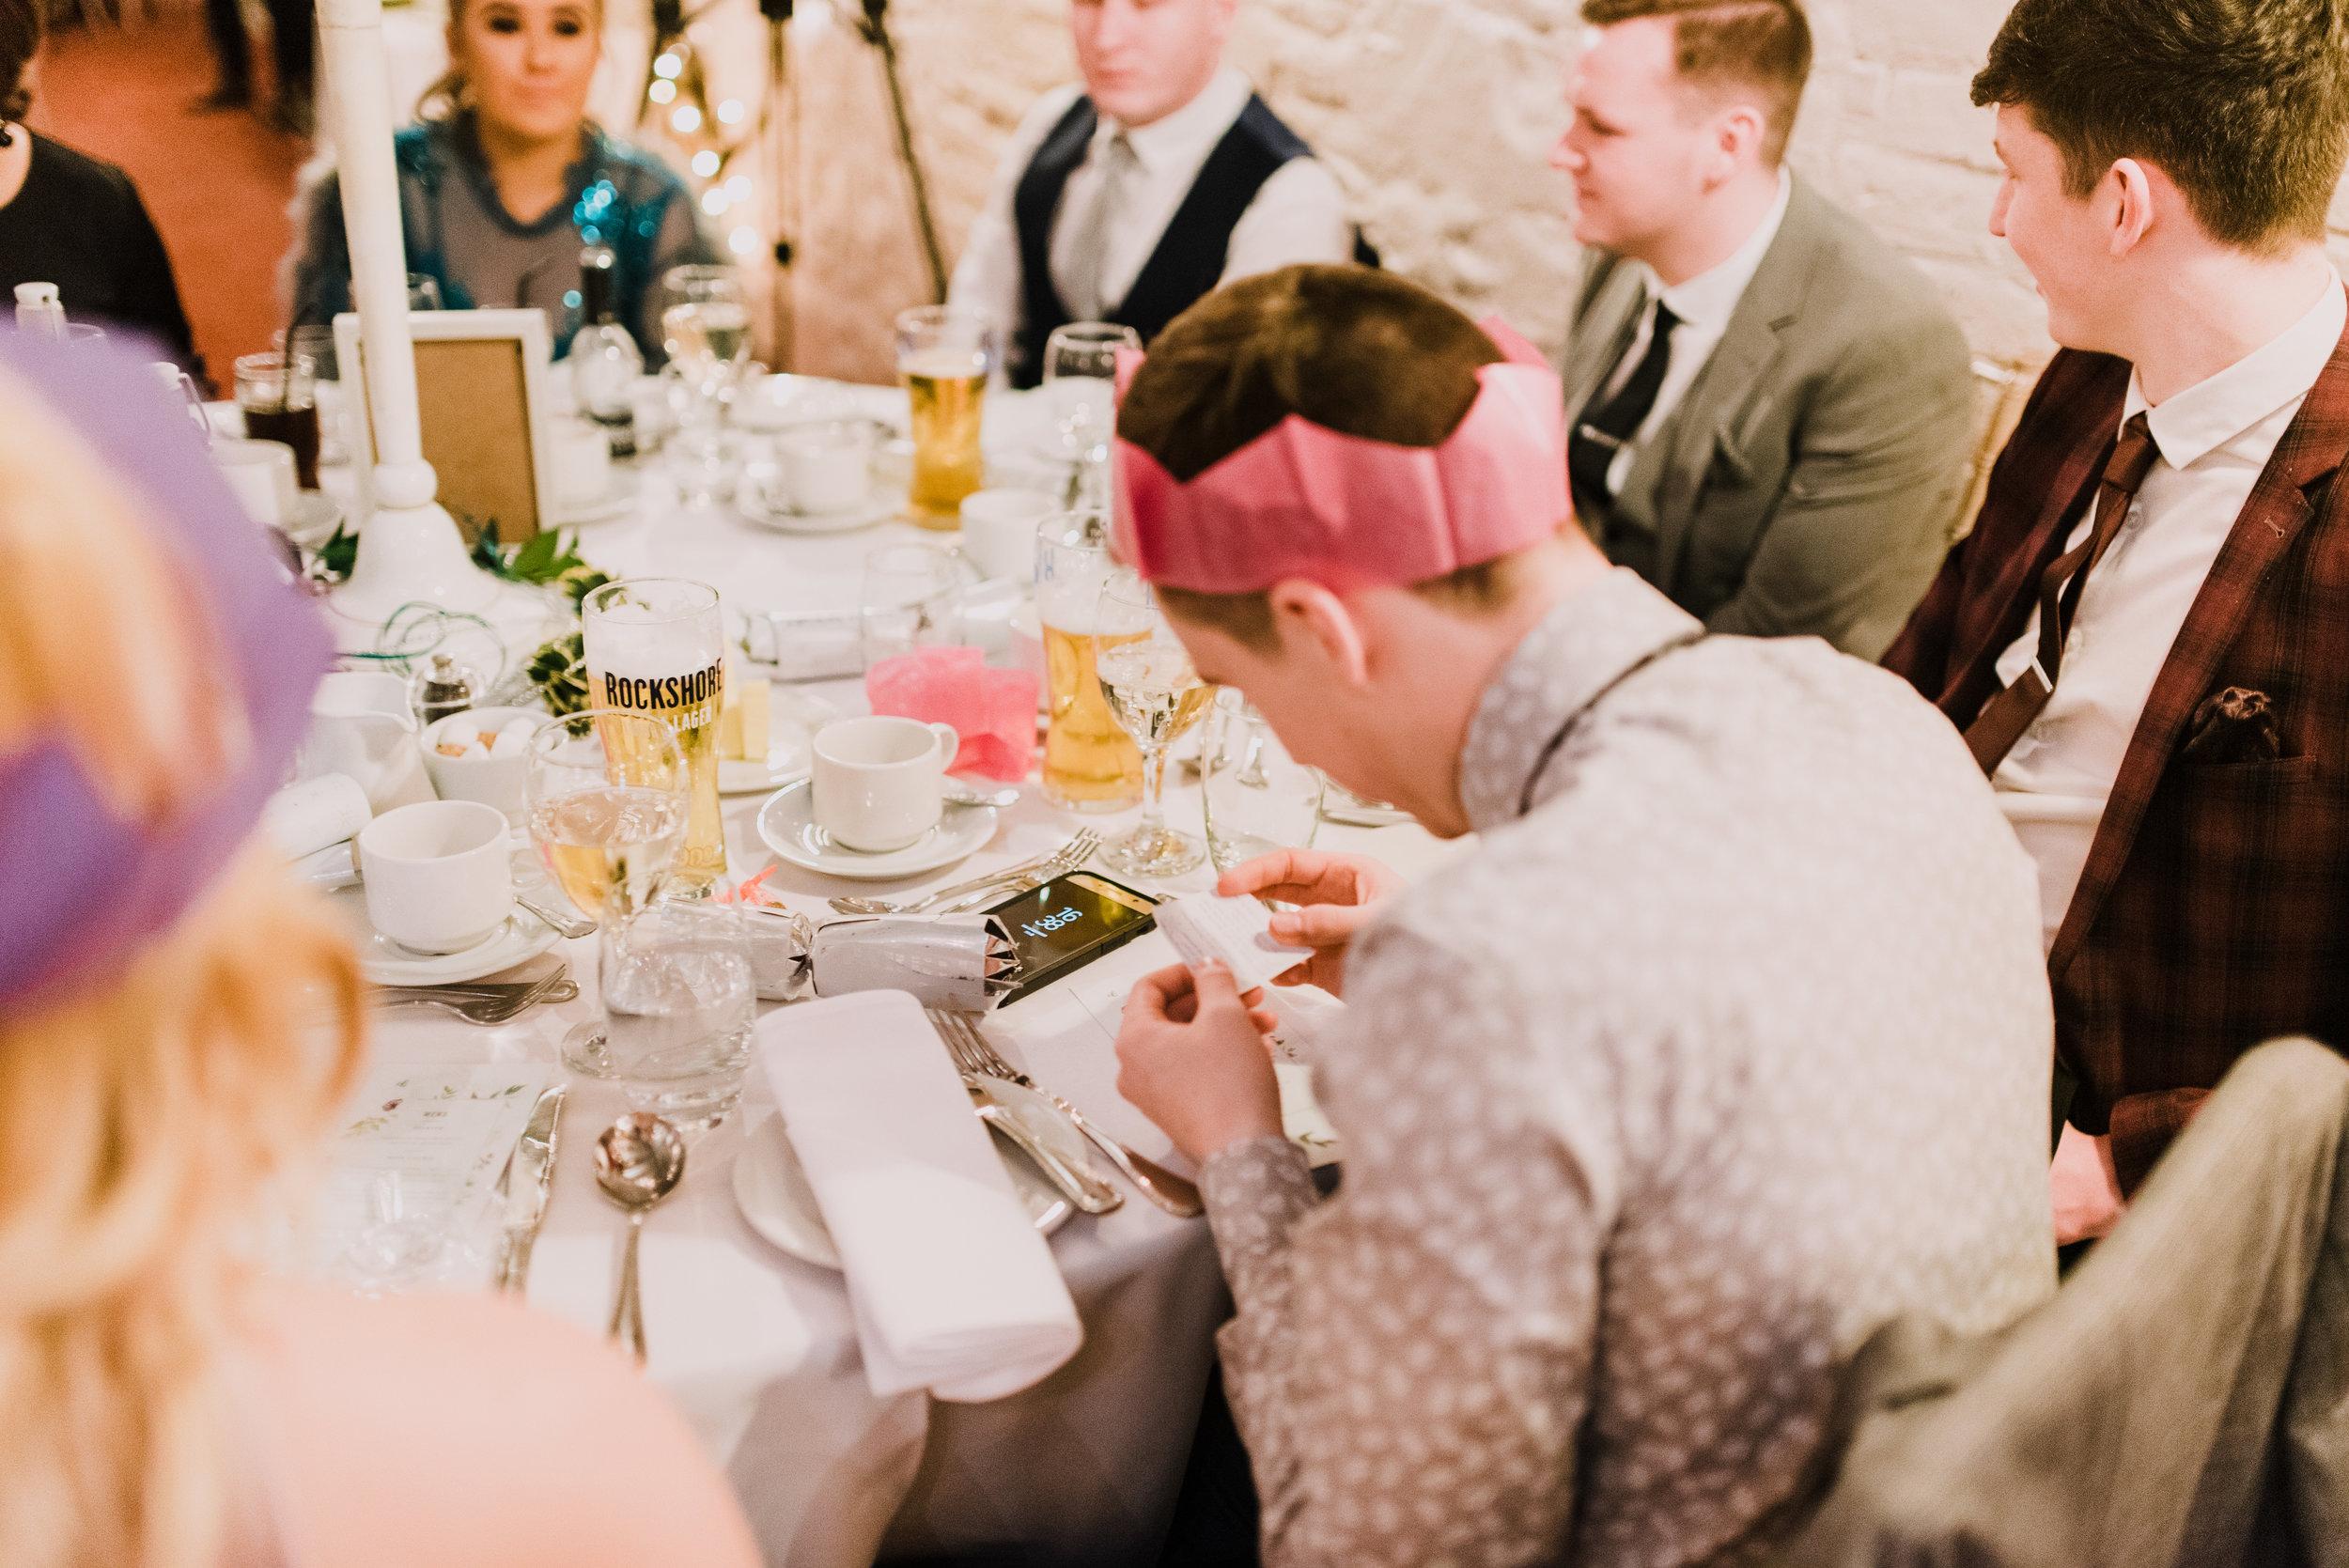 larchfield estate wedding, wedding venues northern ireland, barn wedding venues northern ireland, wedding photos larchfield estate, shane todd wedding, larchfield wedding decor ideas (11).jpg